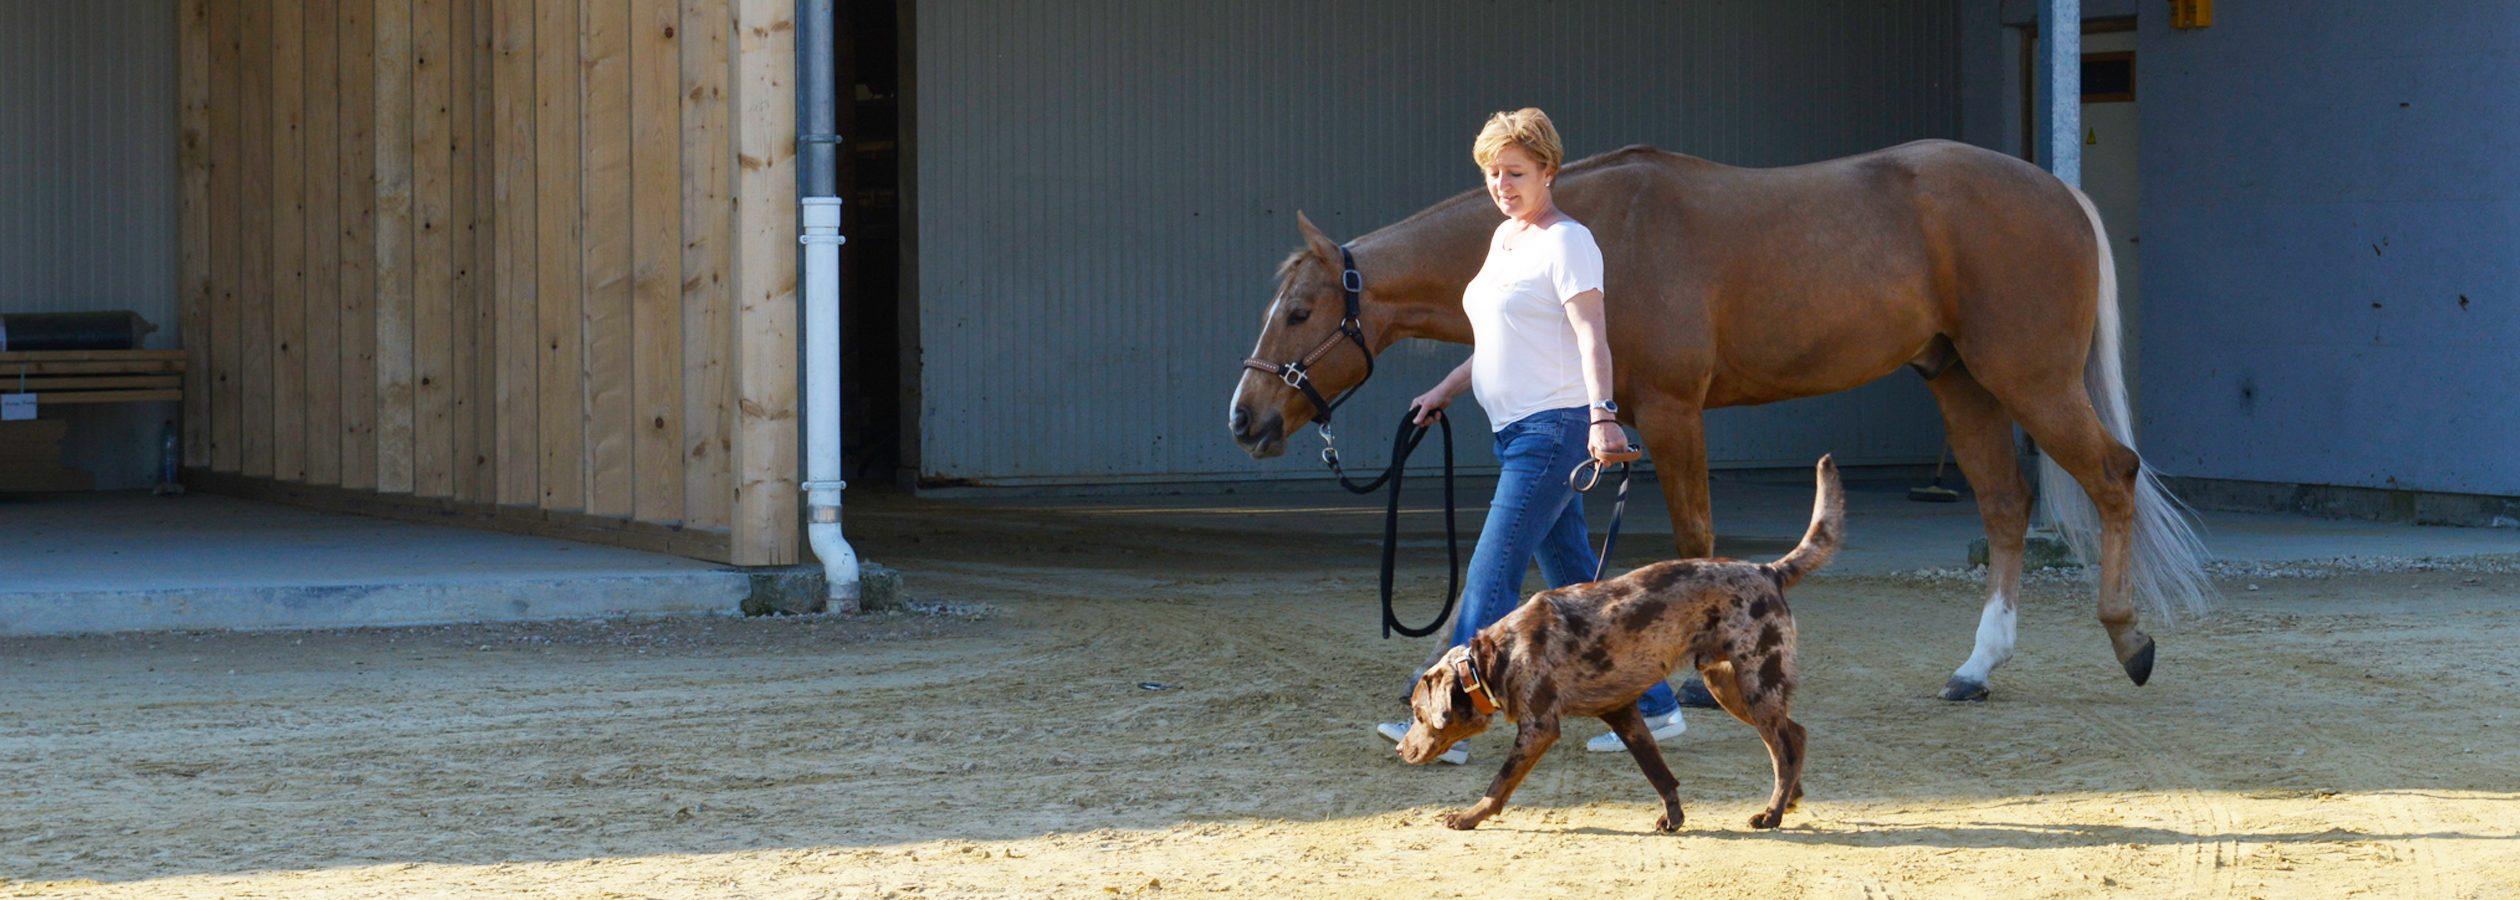 Header_HorseAcademy2